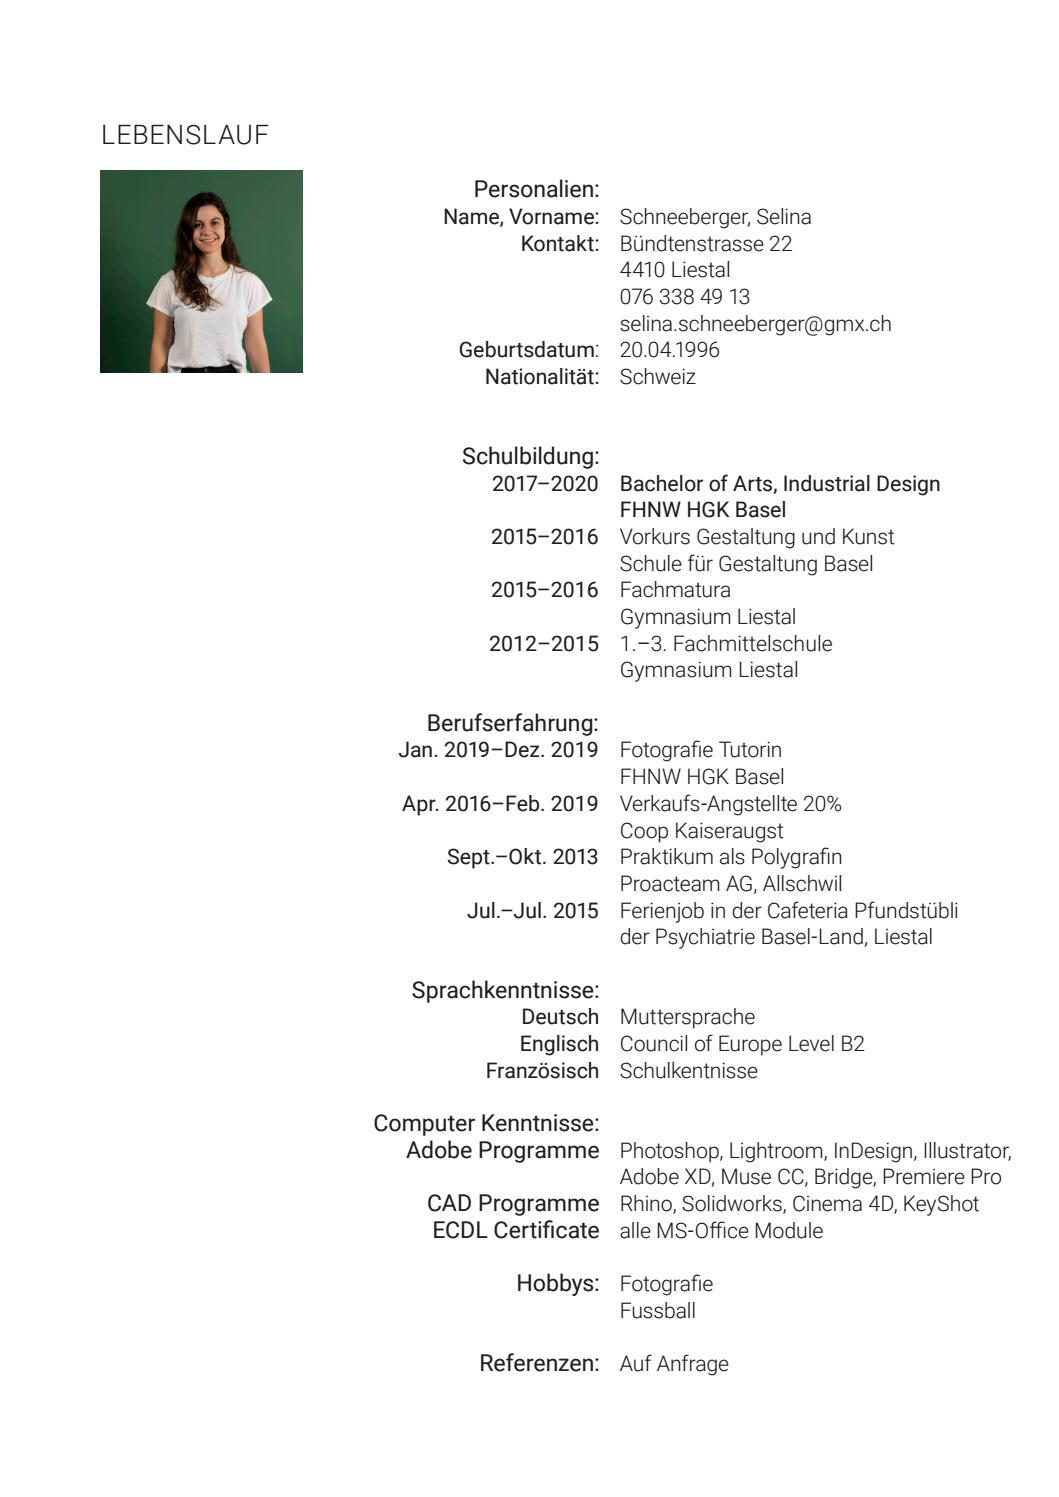 Lebenslauf Selina Schneeberger by Selina Schneeberger   issuu